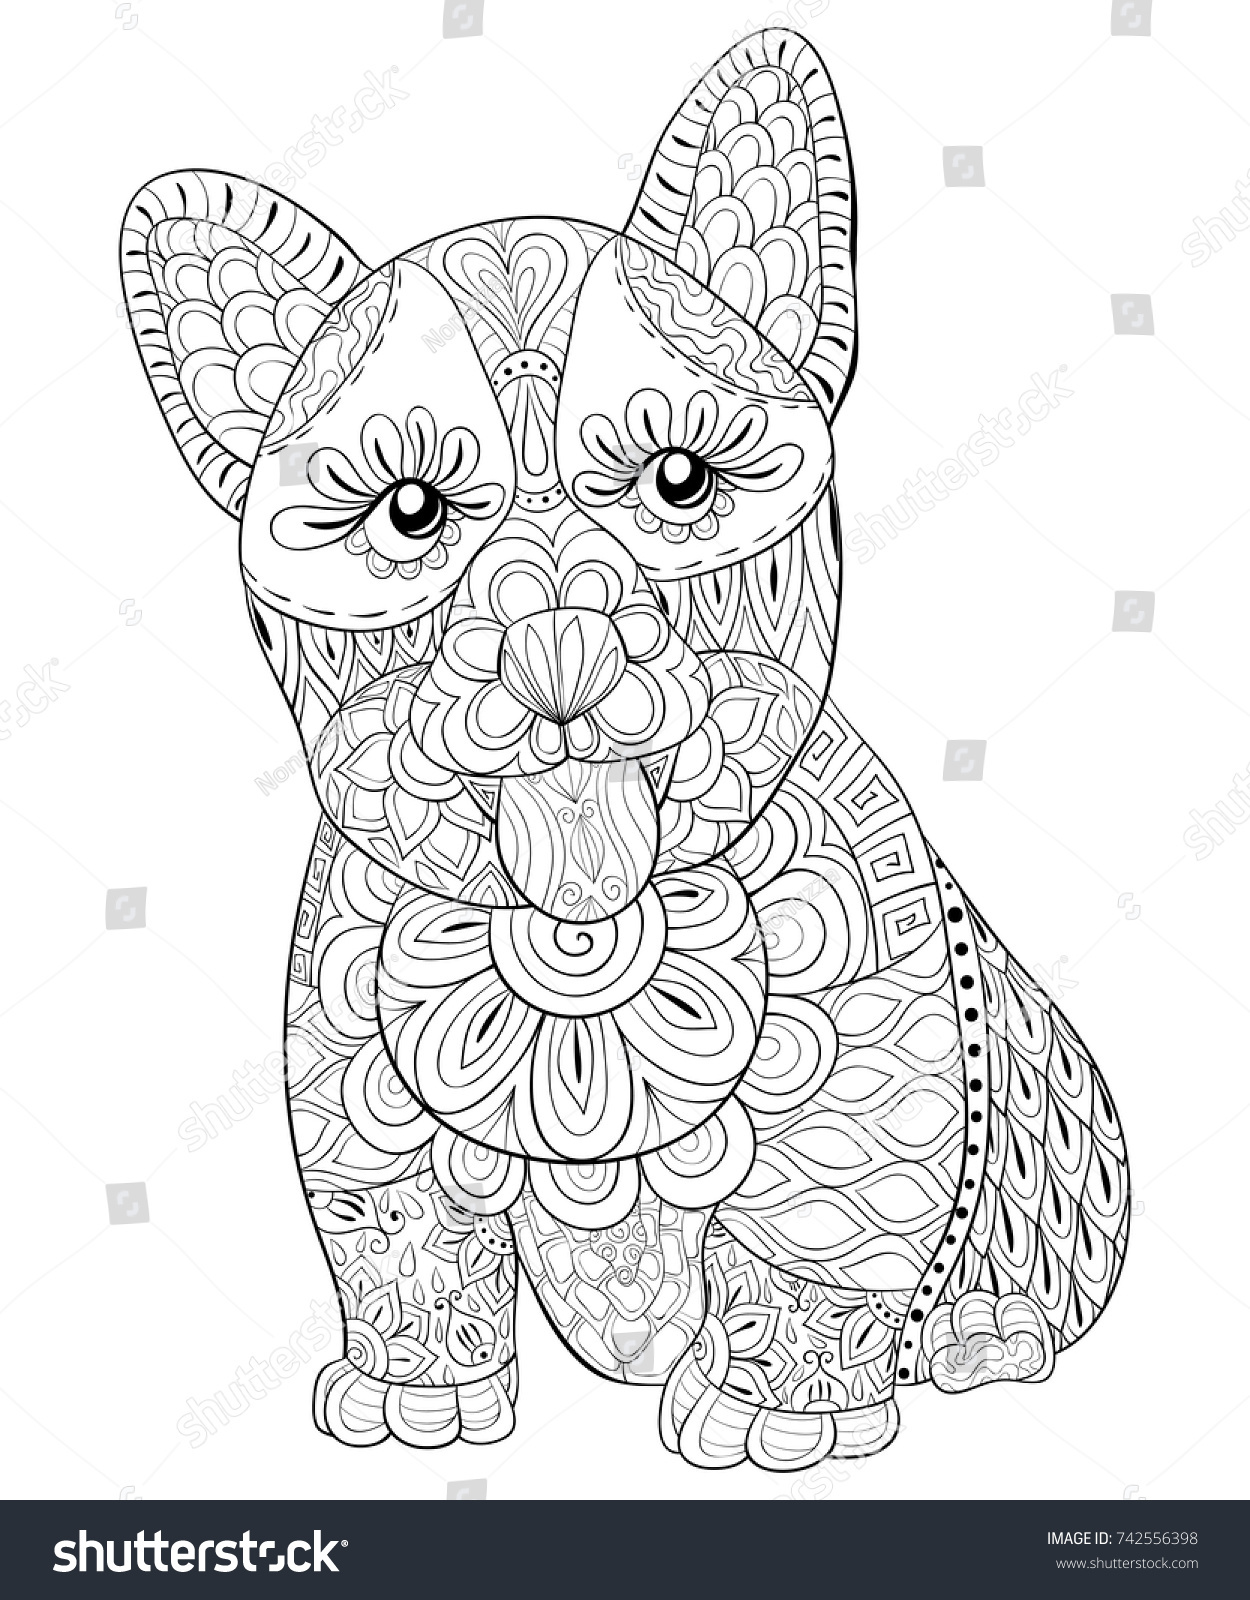 Adult Coloring Pagebook A Cute Little DogZen Art Style Illustration